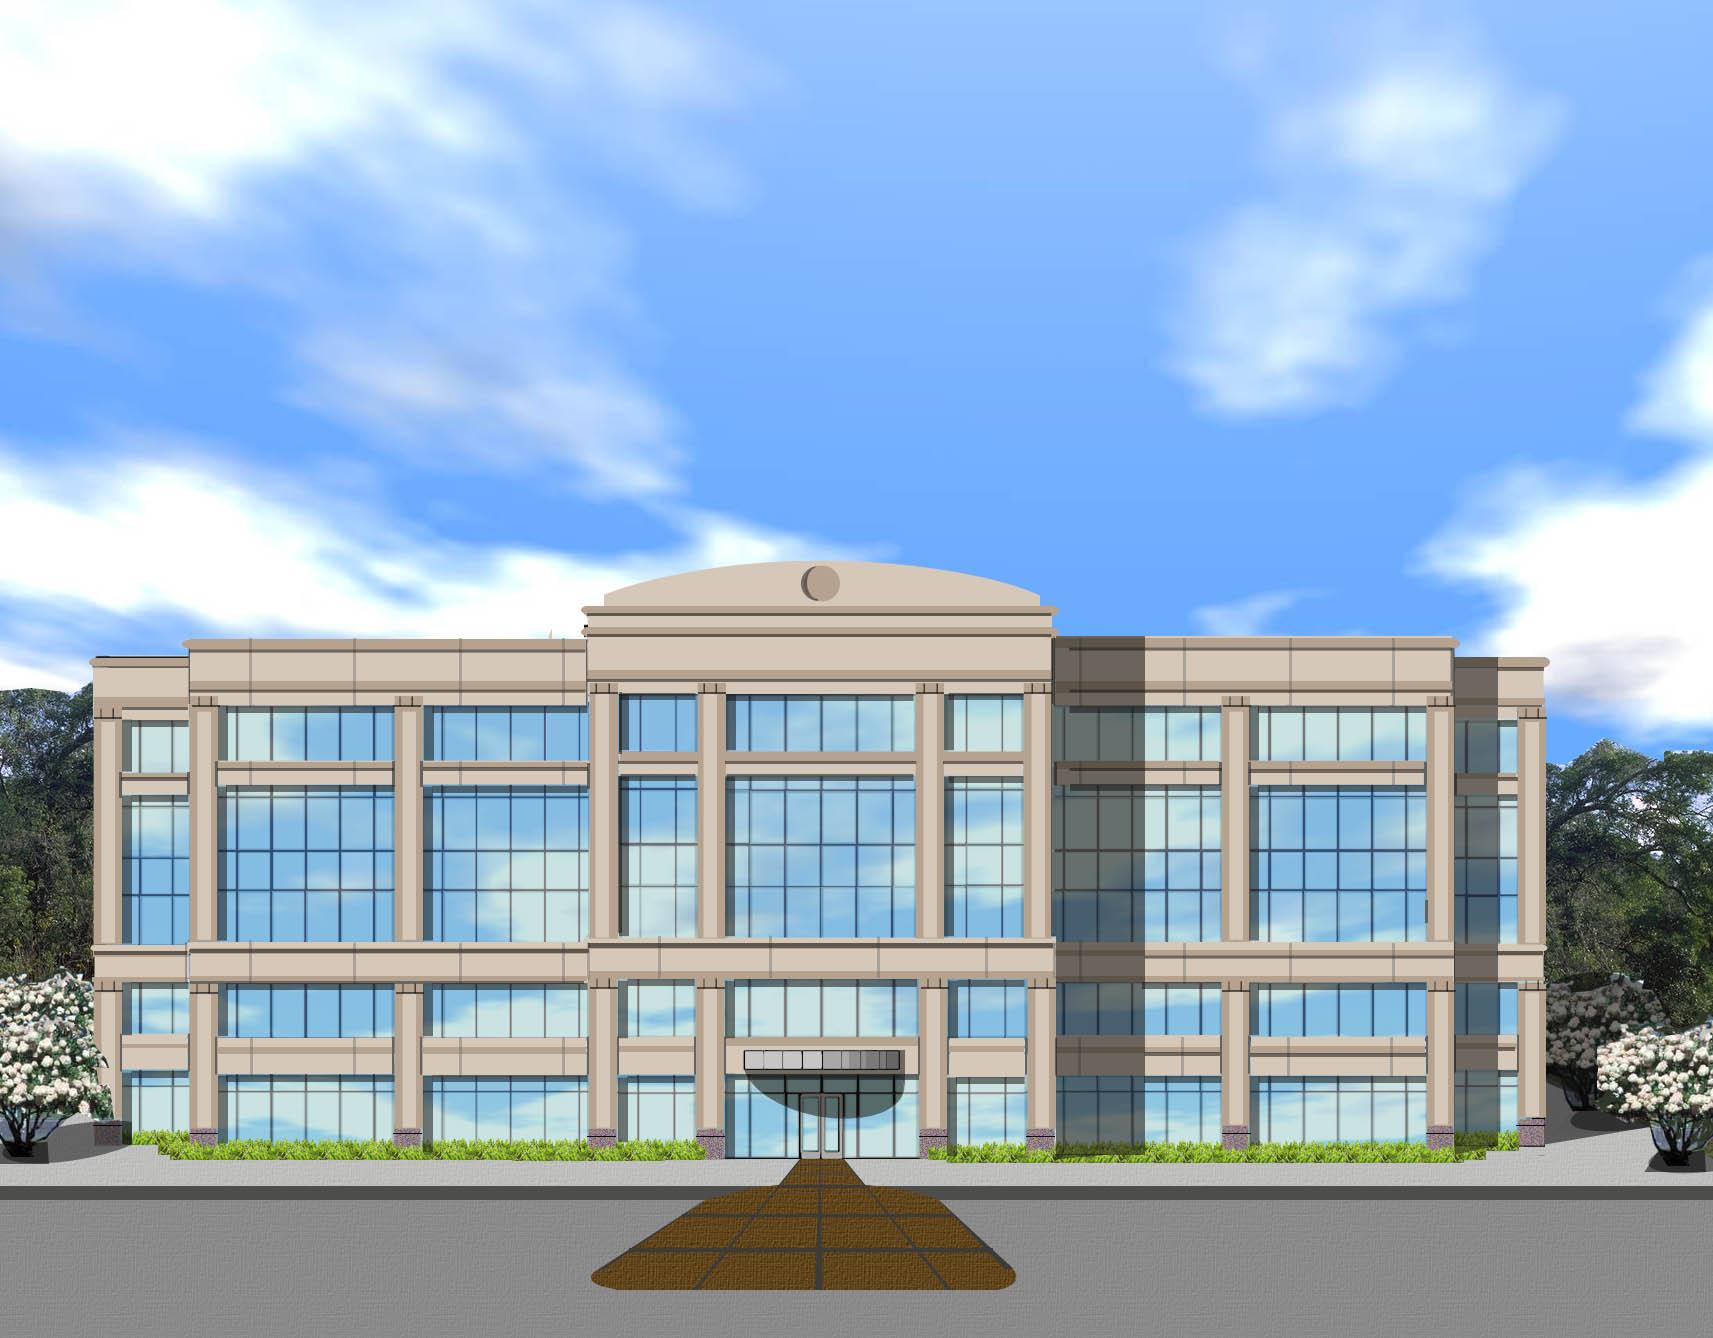 Precision constructors medical office. Buildings clipart building design